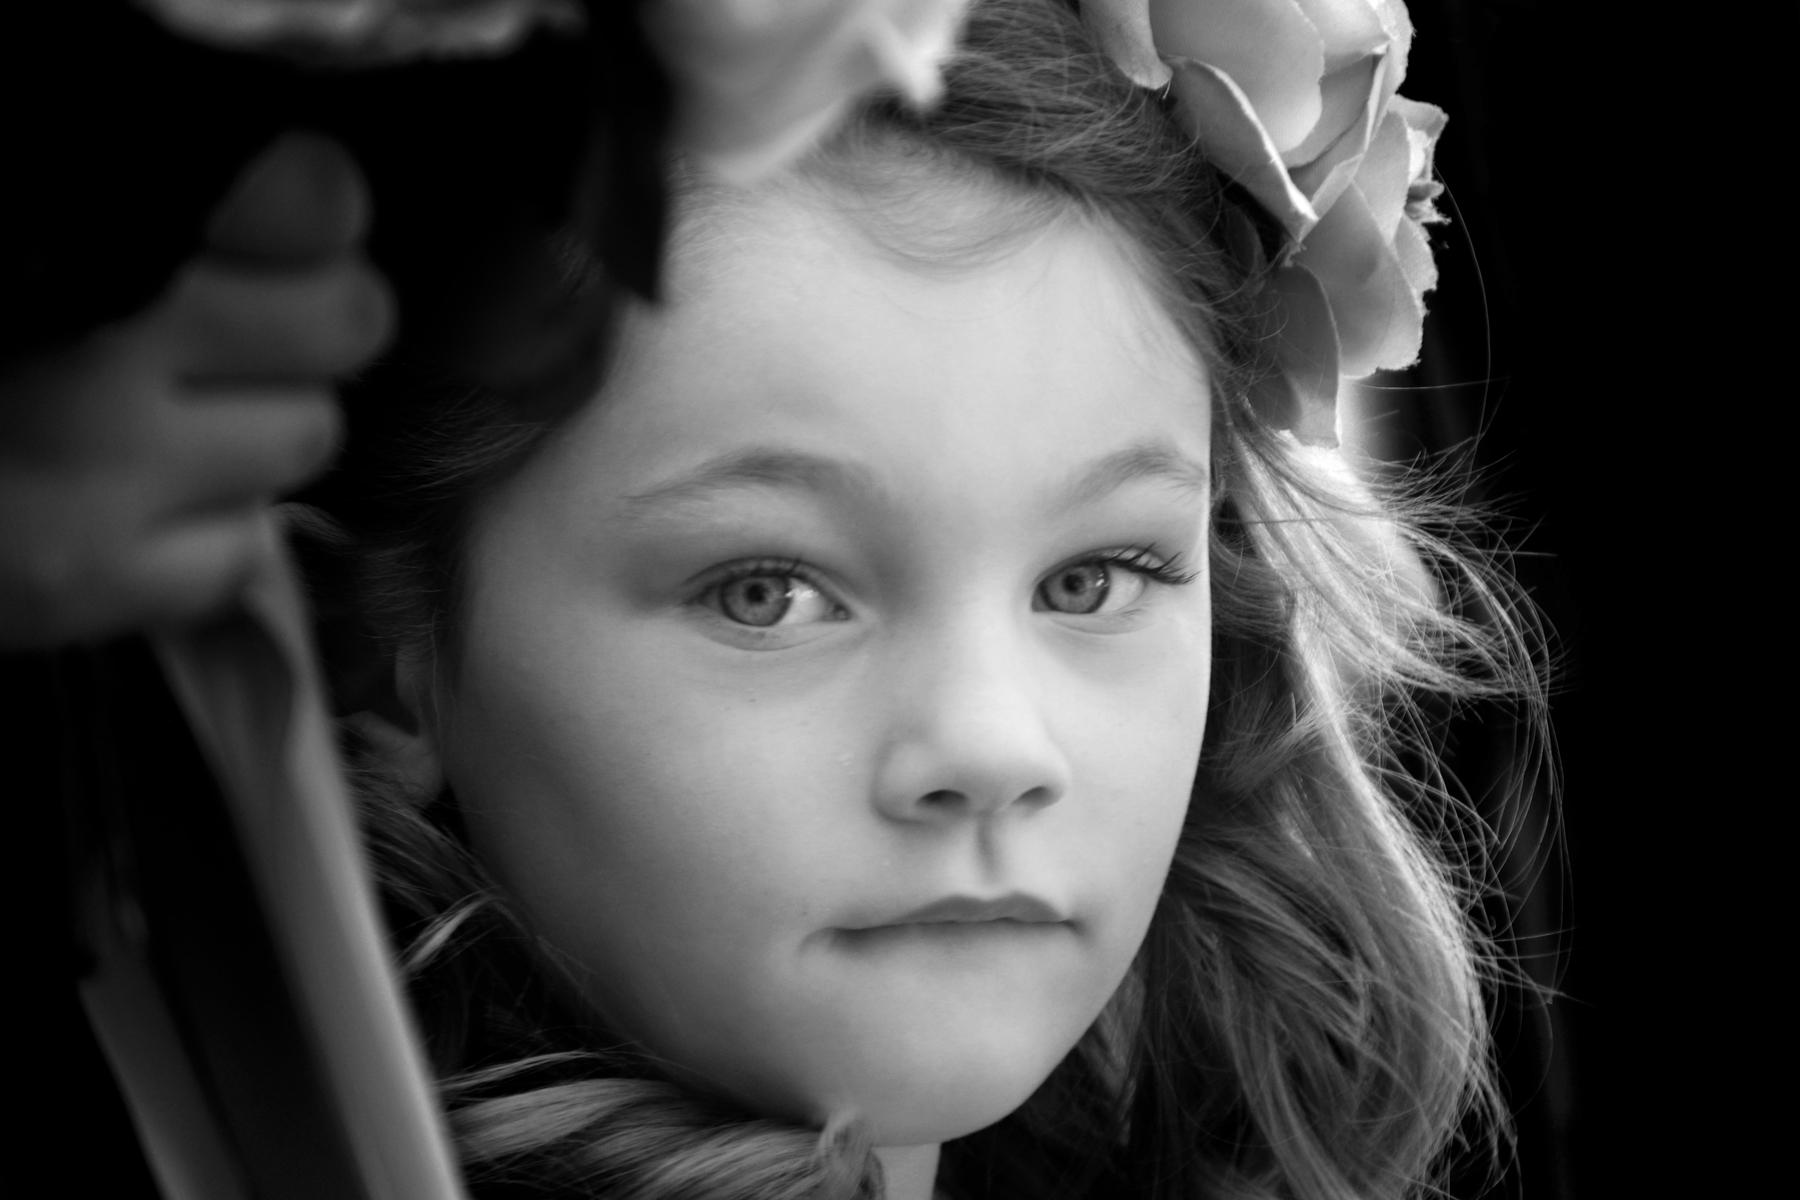 Karen_Burgess_The Flowergirl.jpg